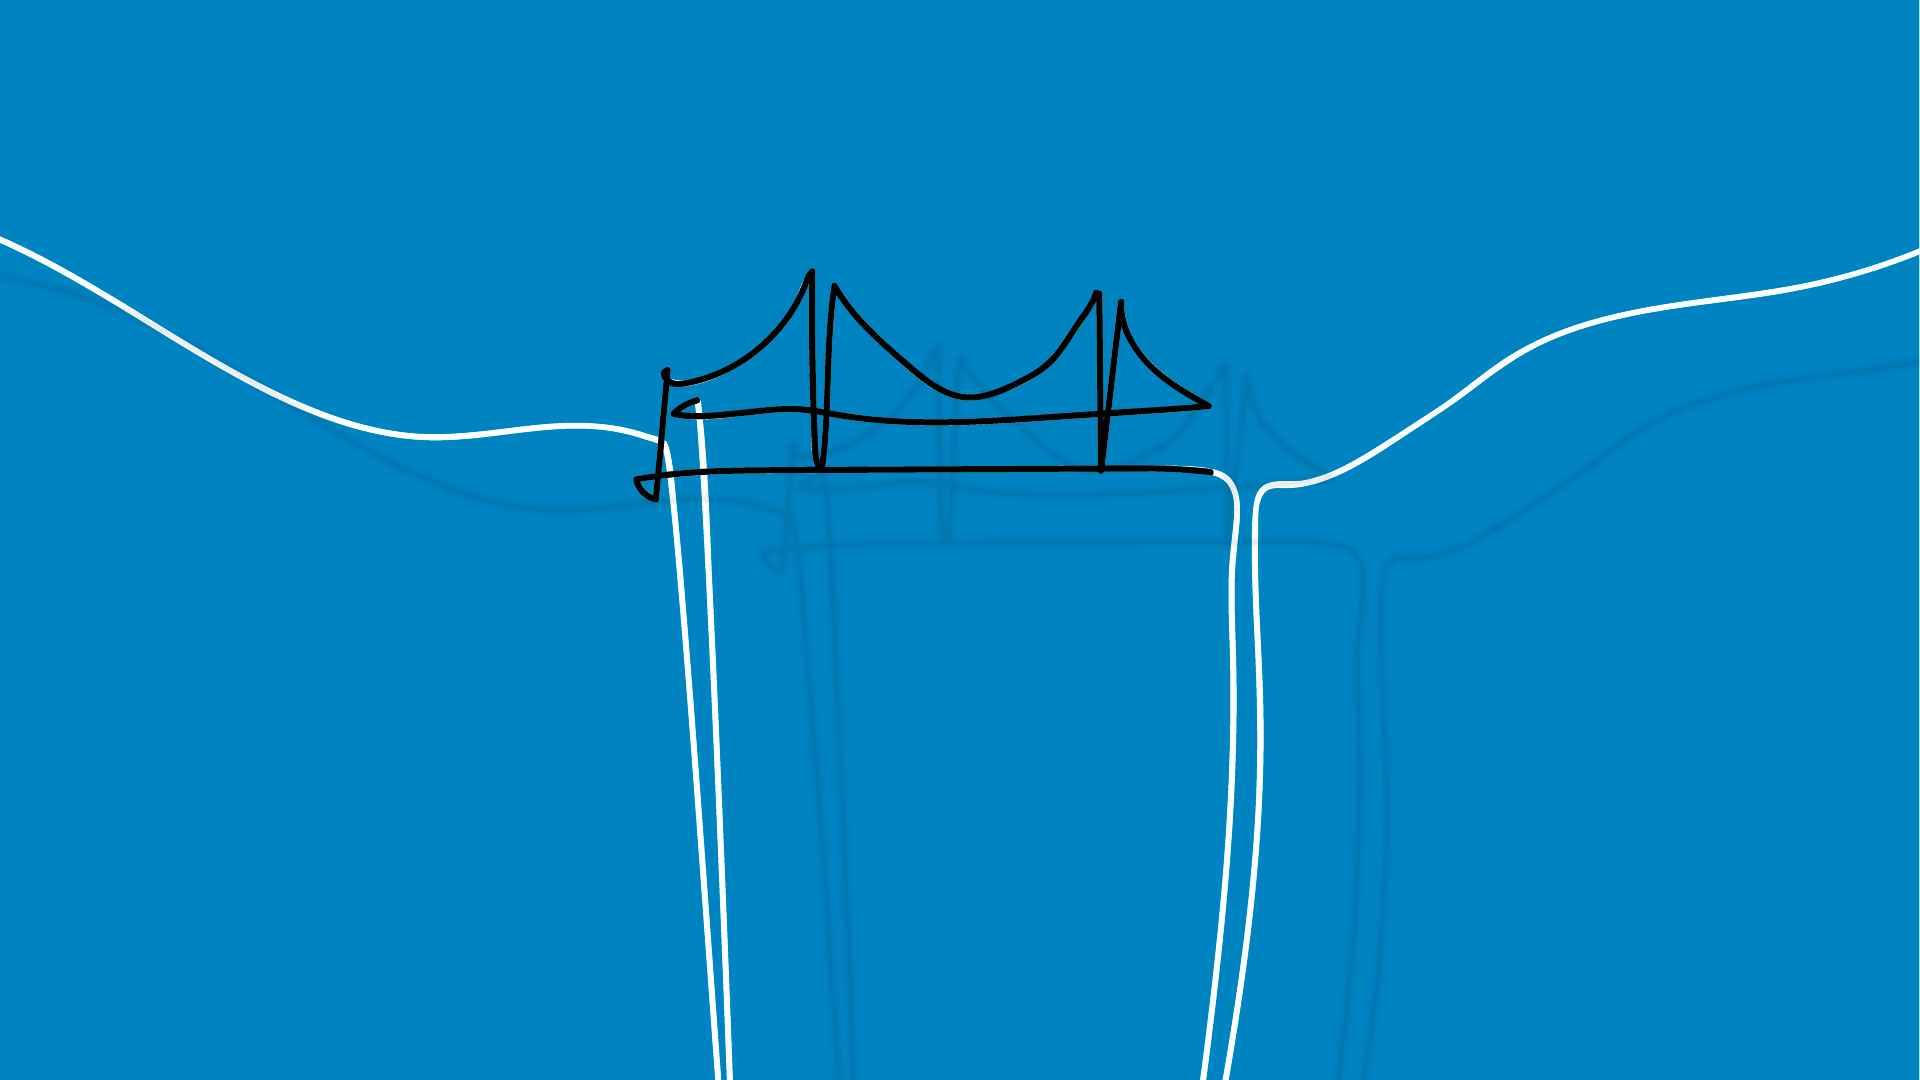 Bridge - 2d Animation